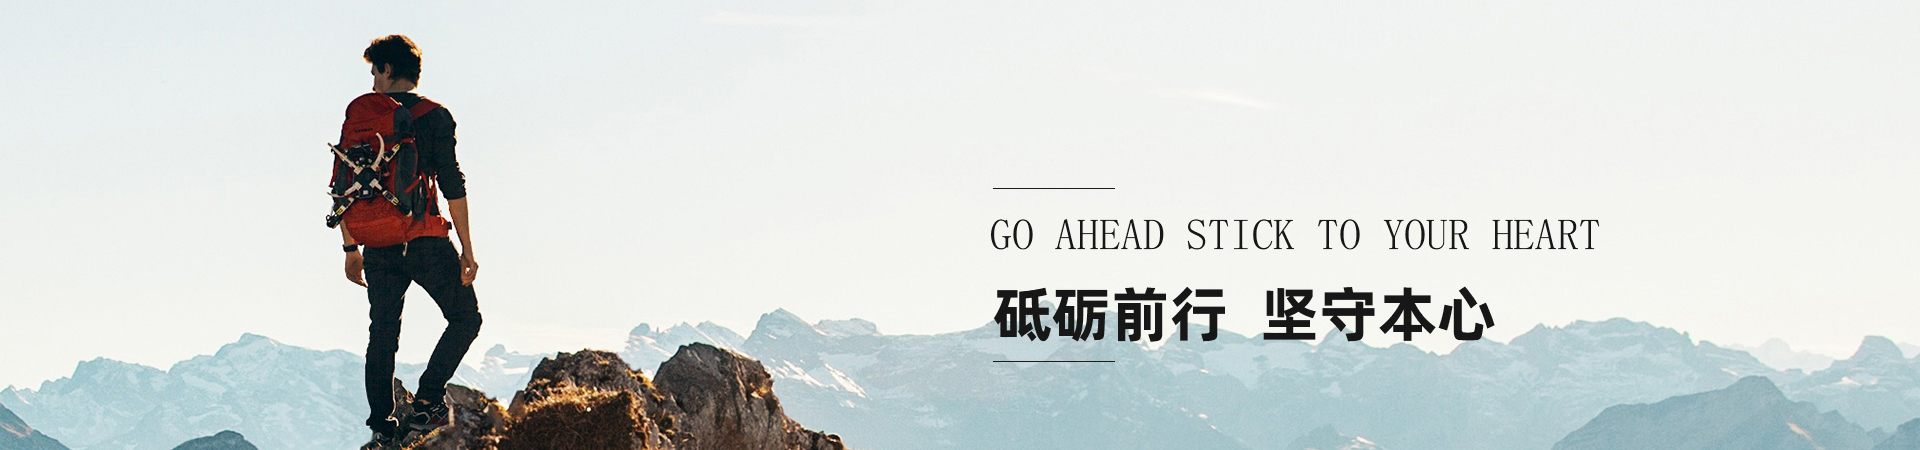 http://www.jingyouhb.com/data/upload/201911/20191116165113_234.jpg